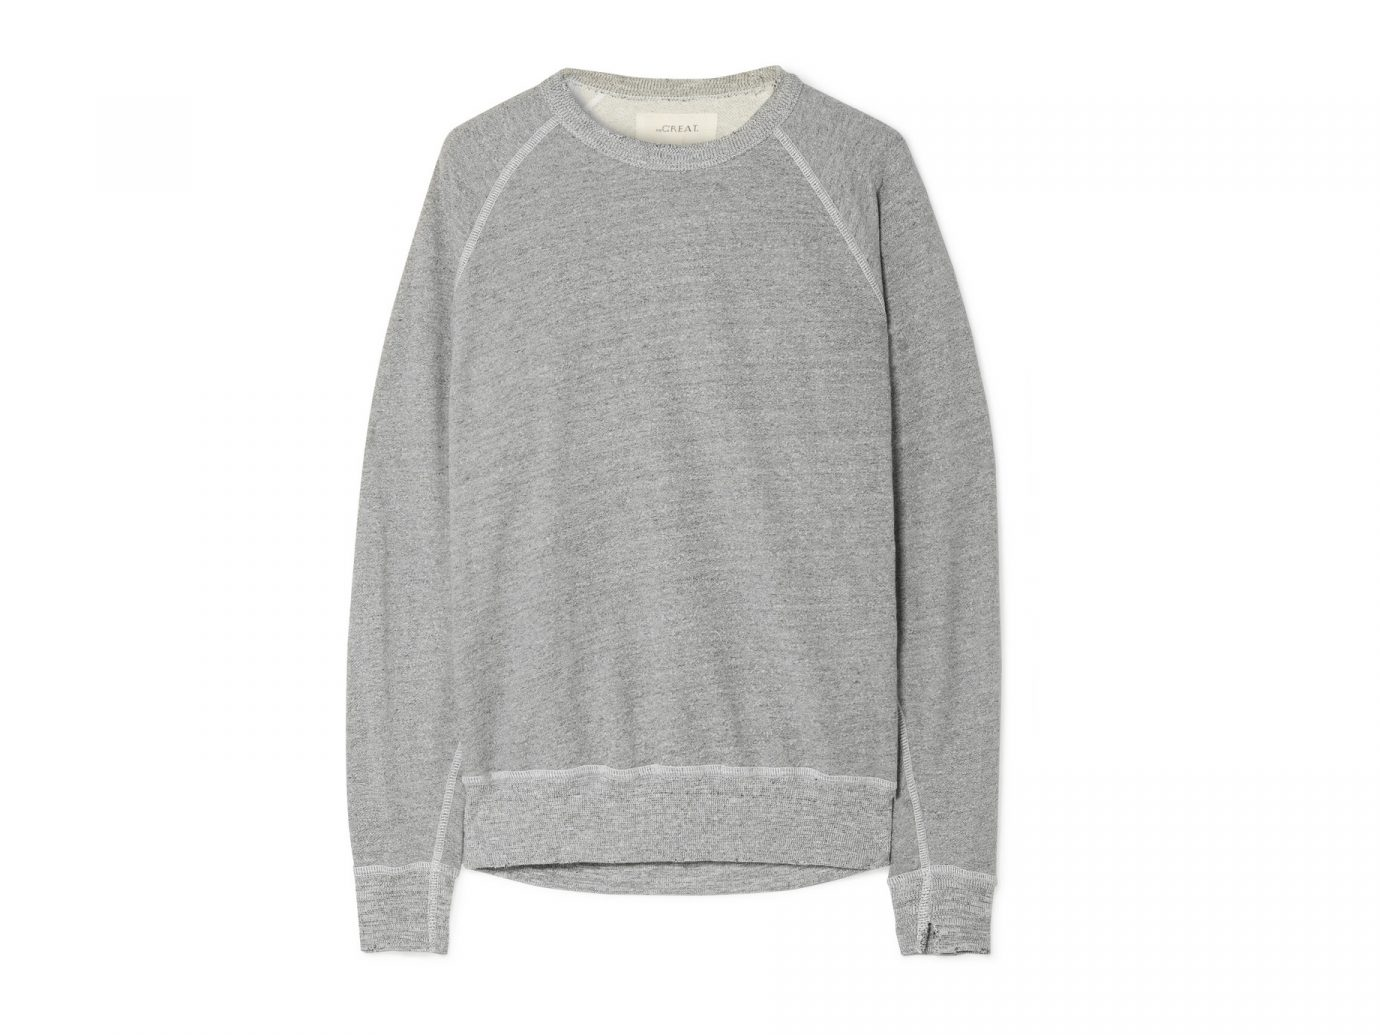 best sweatshirts, The Great The College distressed cotton-blend jersey sweatshirt